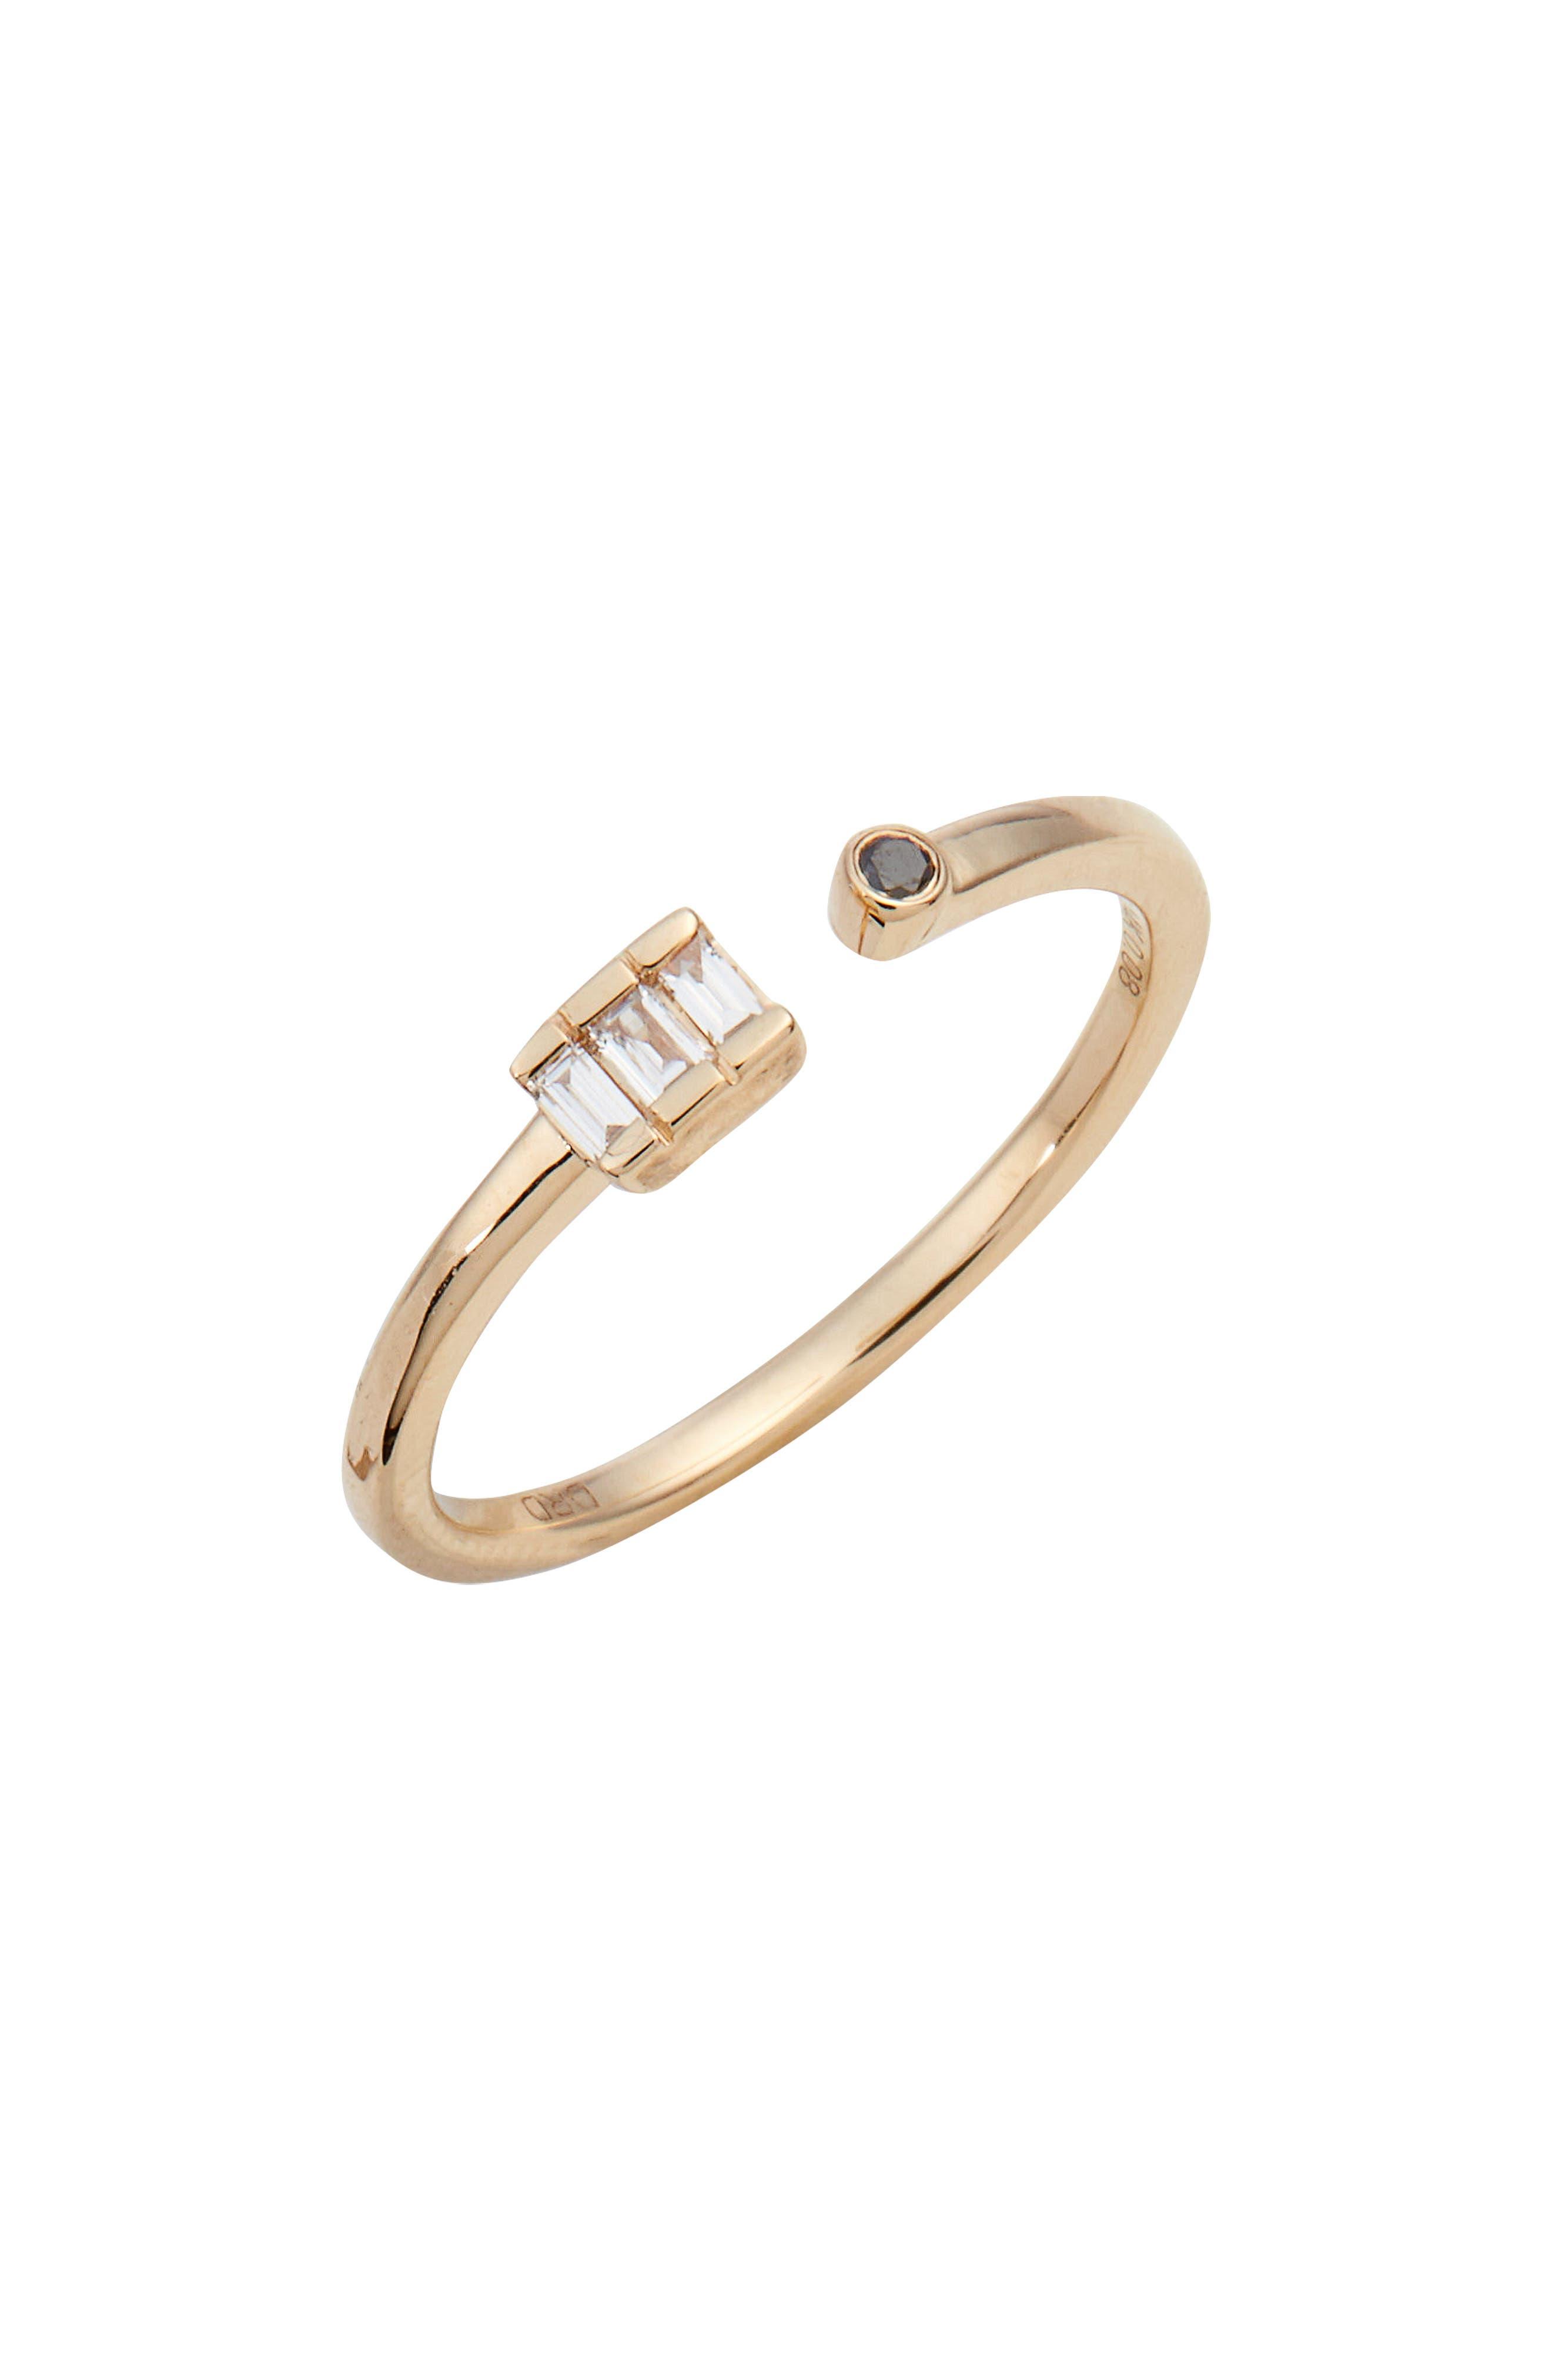 Alternate Image 1 Selected - Dana Rebecca Designs Sadie Diamond Bypass Ring